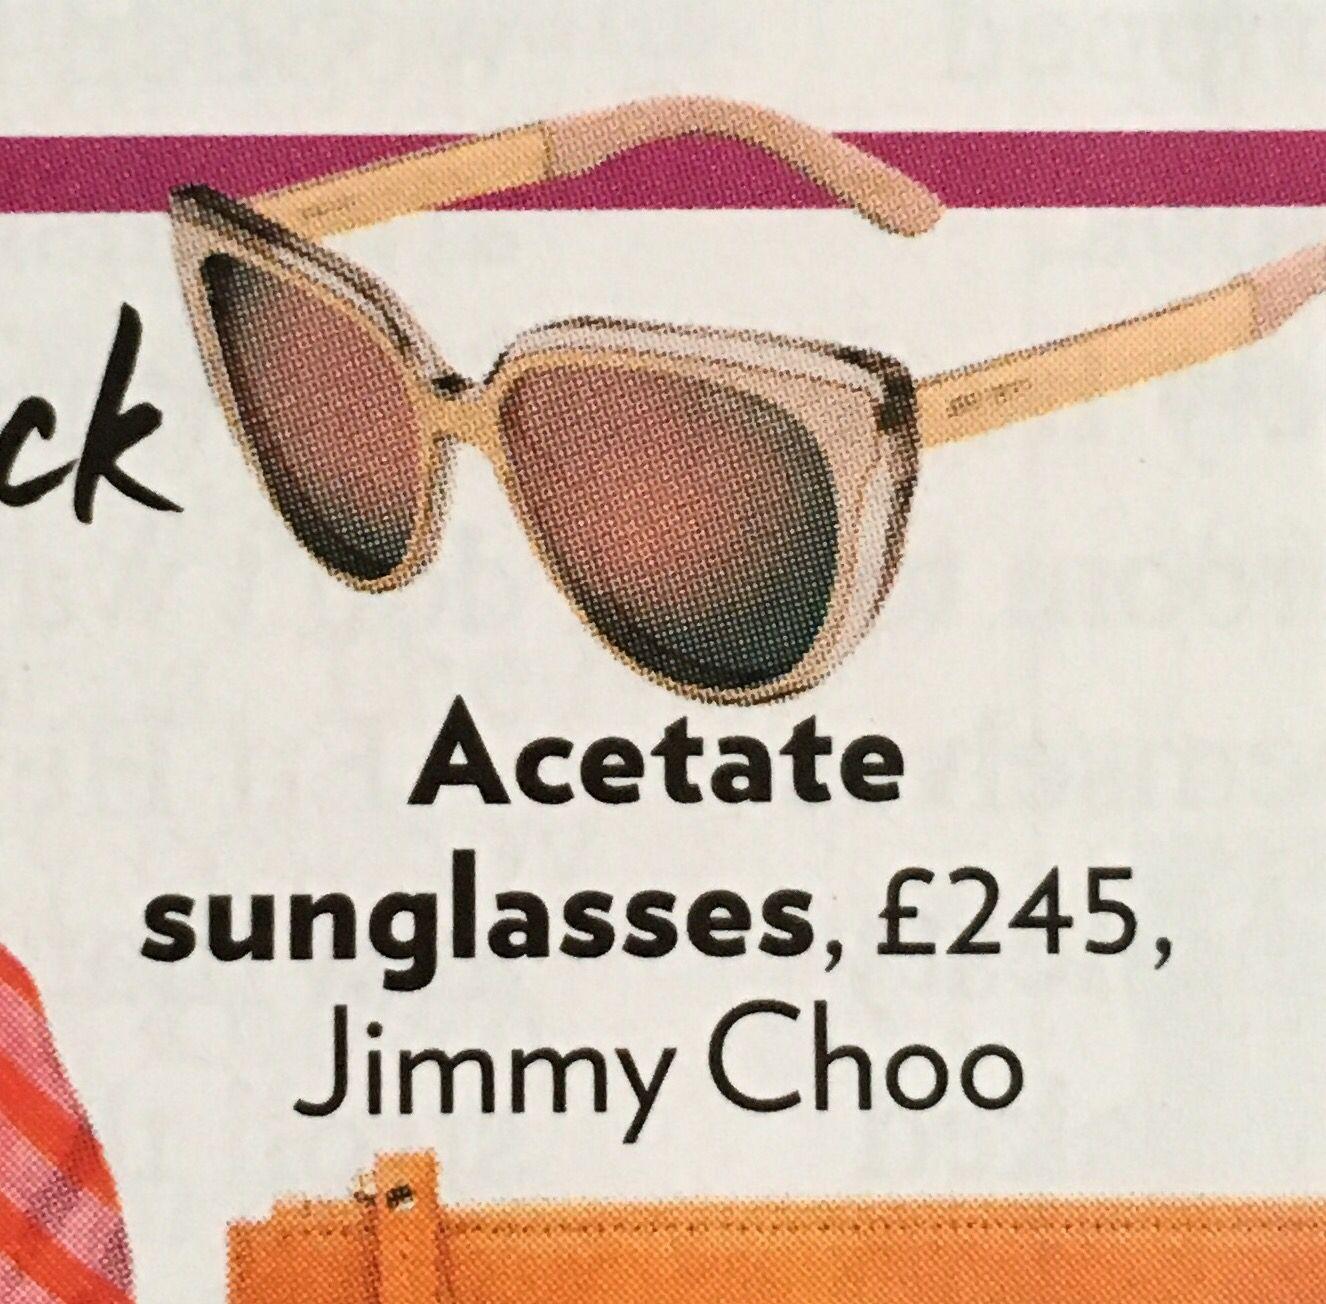 Jimmy choo cindy 1rx greyivrgd via red magazine